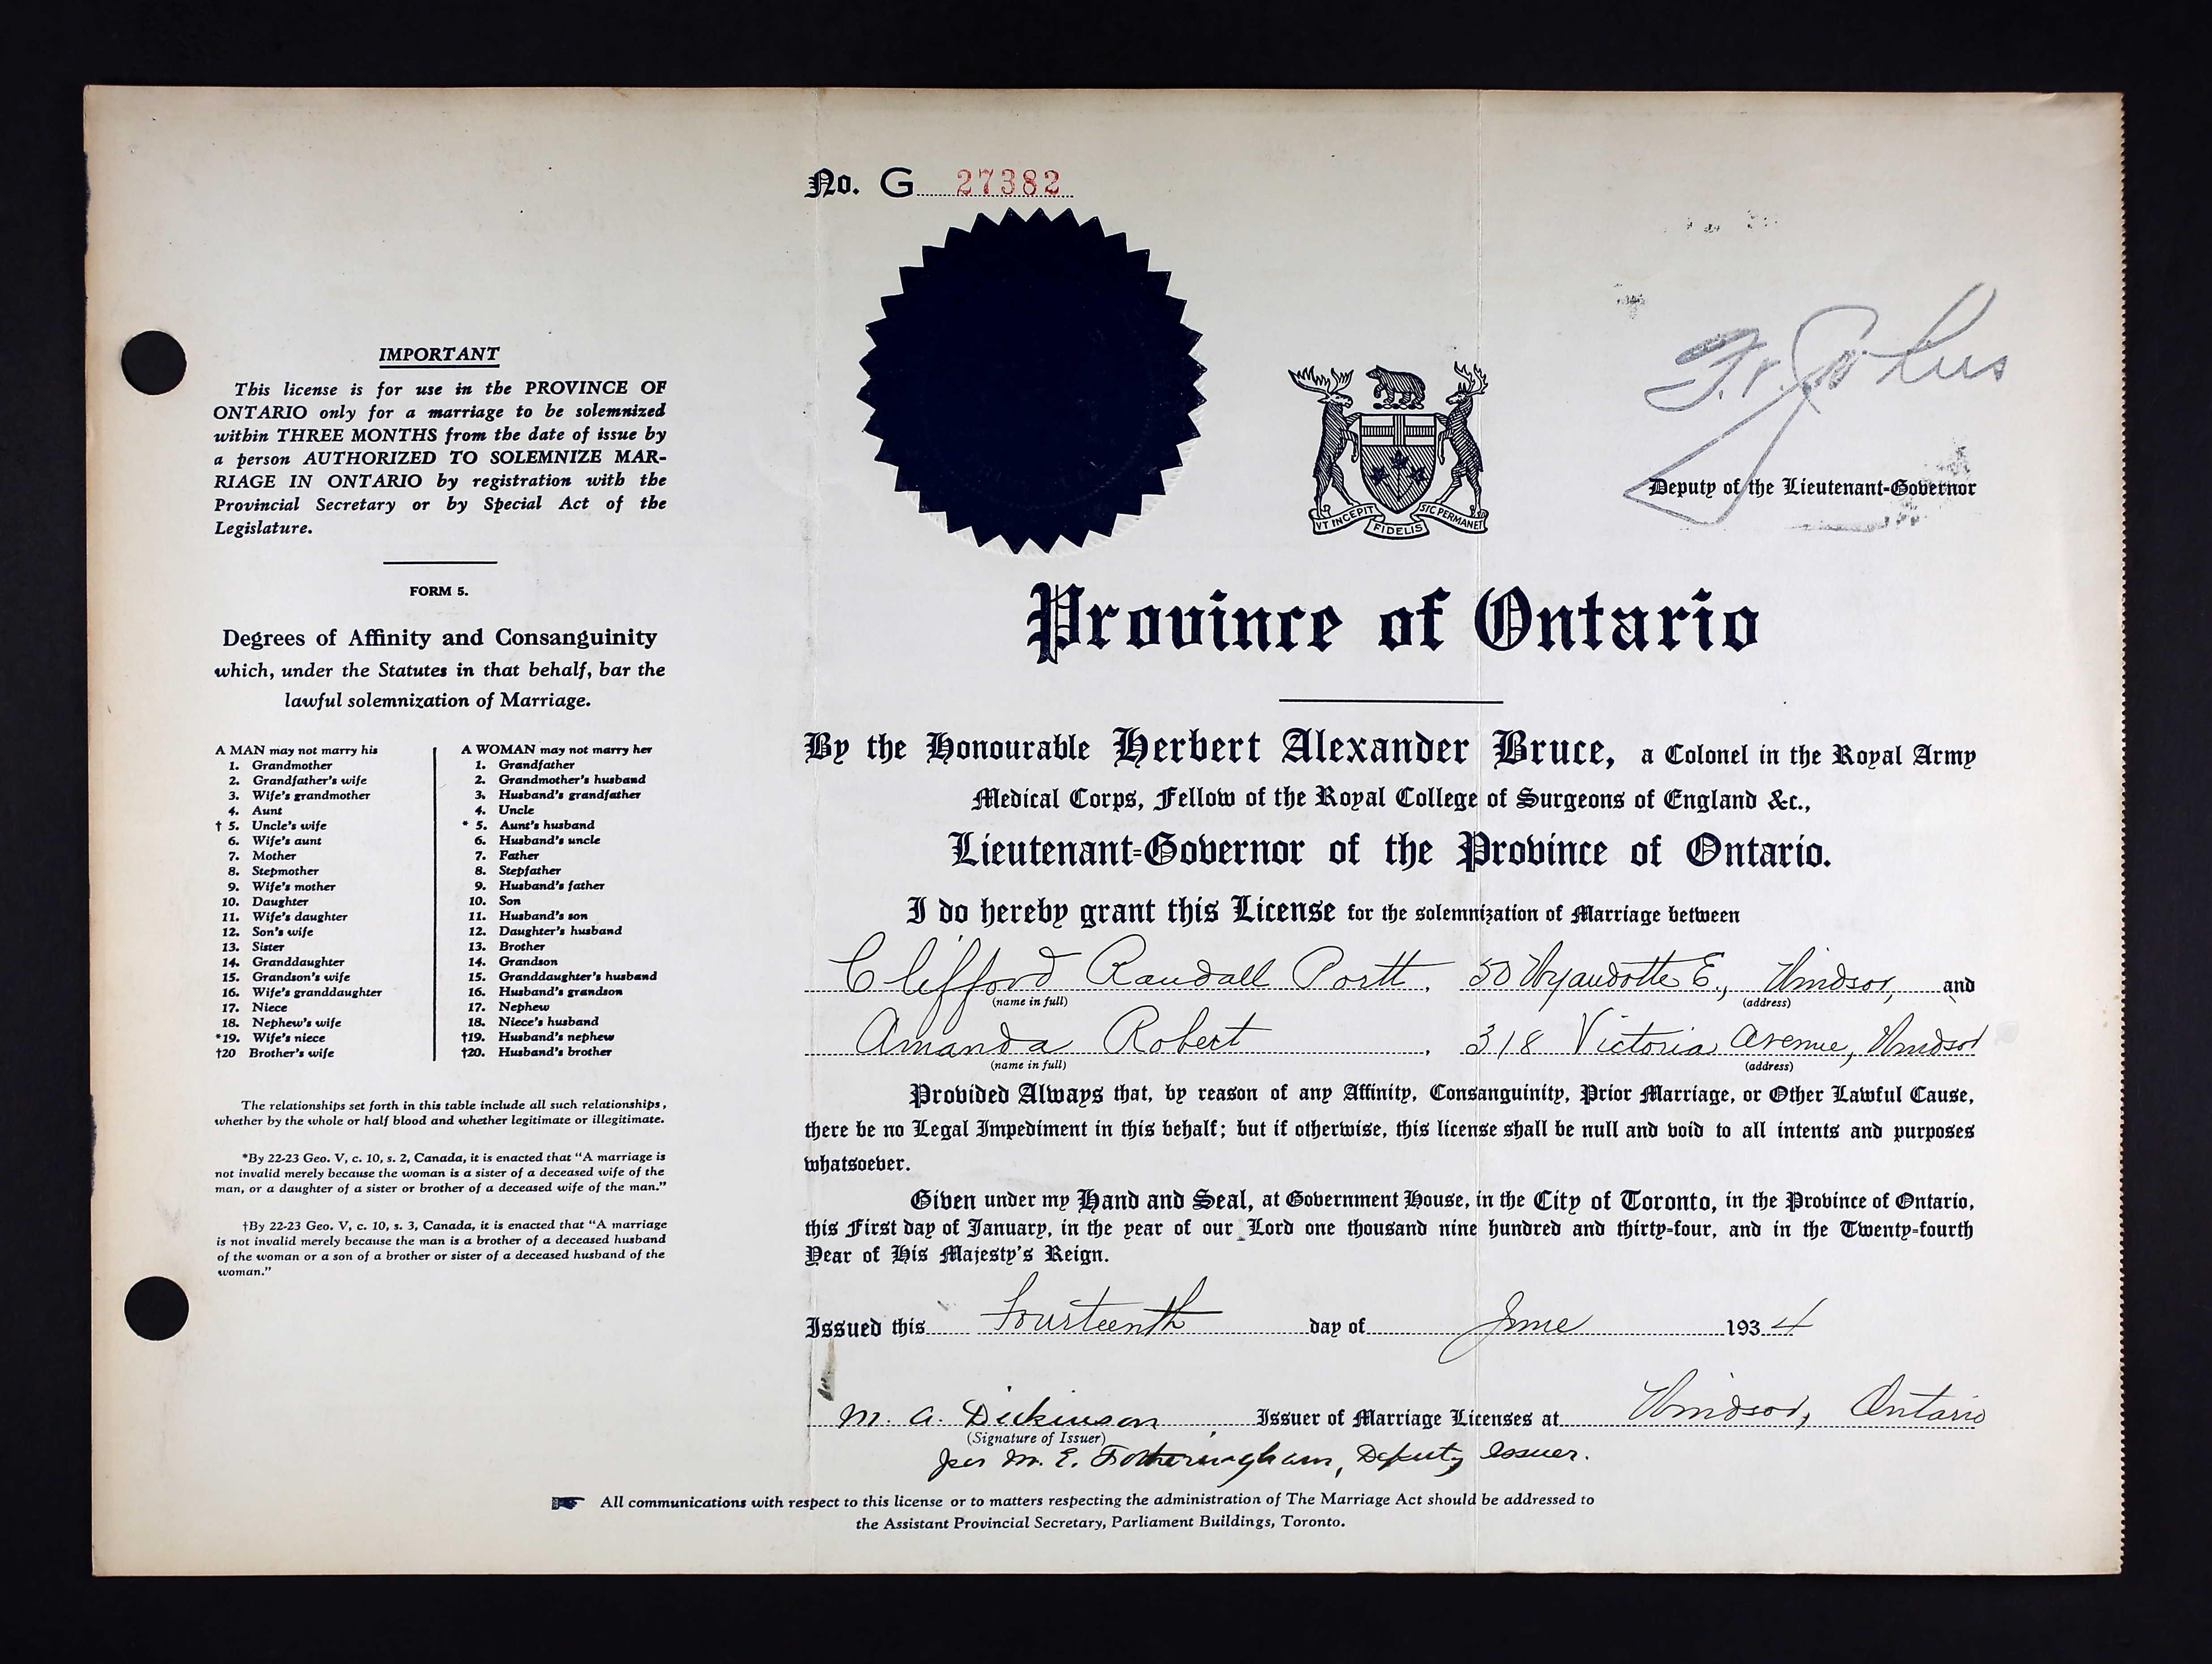 Amanda Page Real Name marriage registration - portt, clifford randall & robert